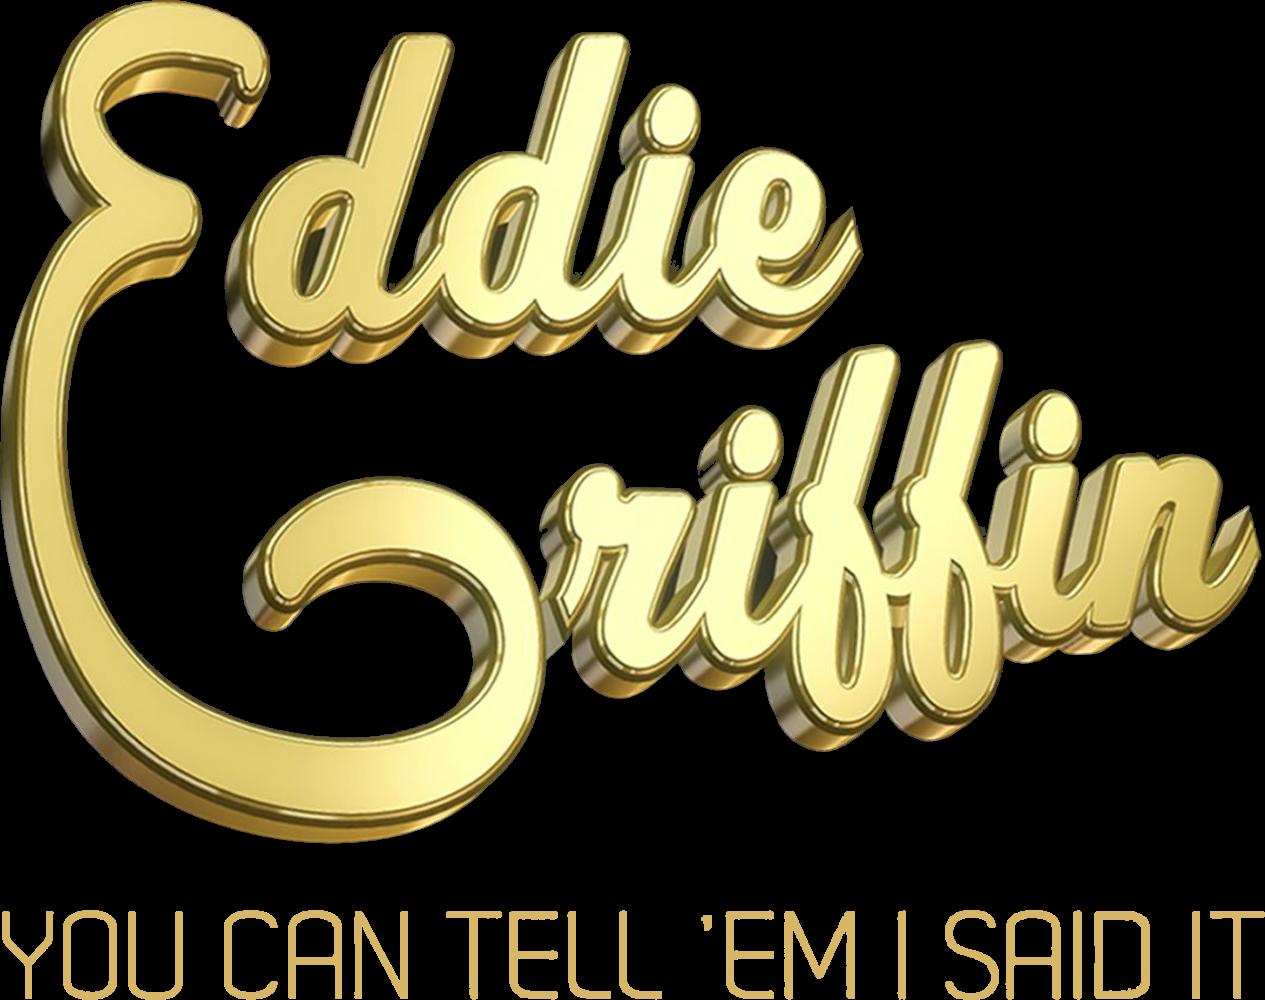 Eddie Griffin: You Can Tell `Em I Said It